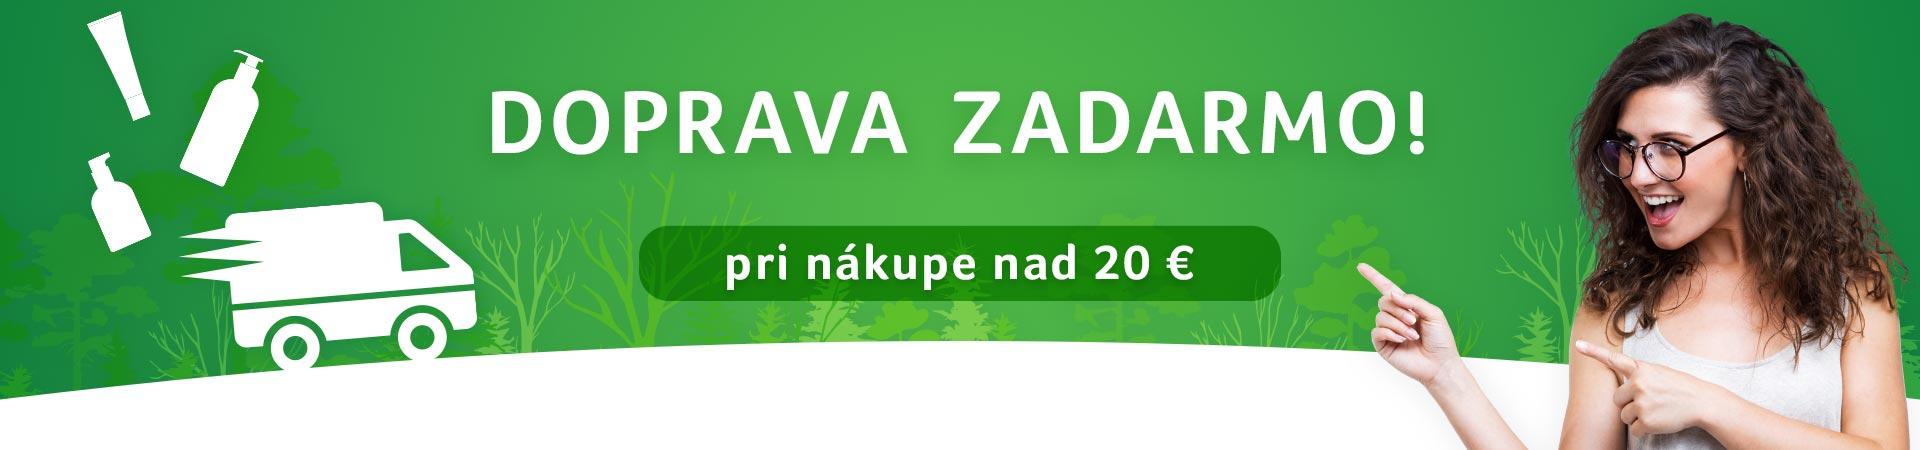 Doprava zadarmo nad 20 eur - Garatujeme doručenie do vianoc